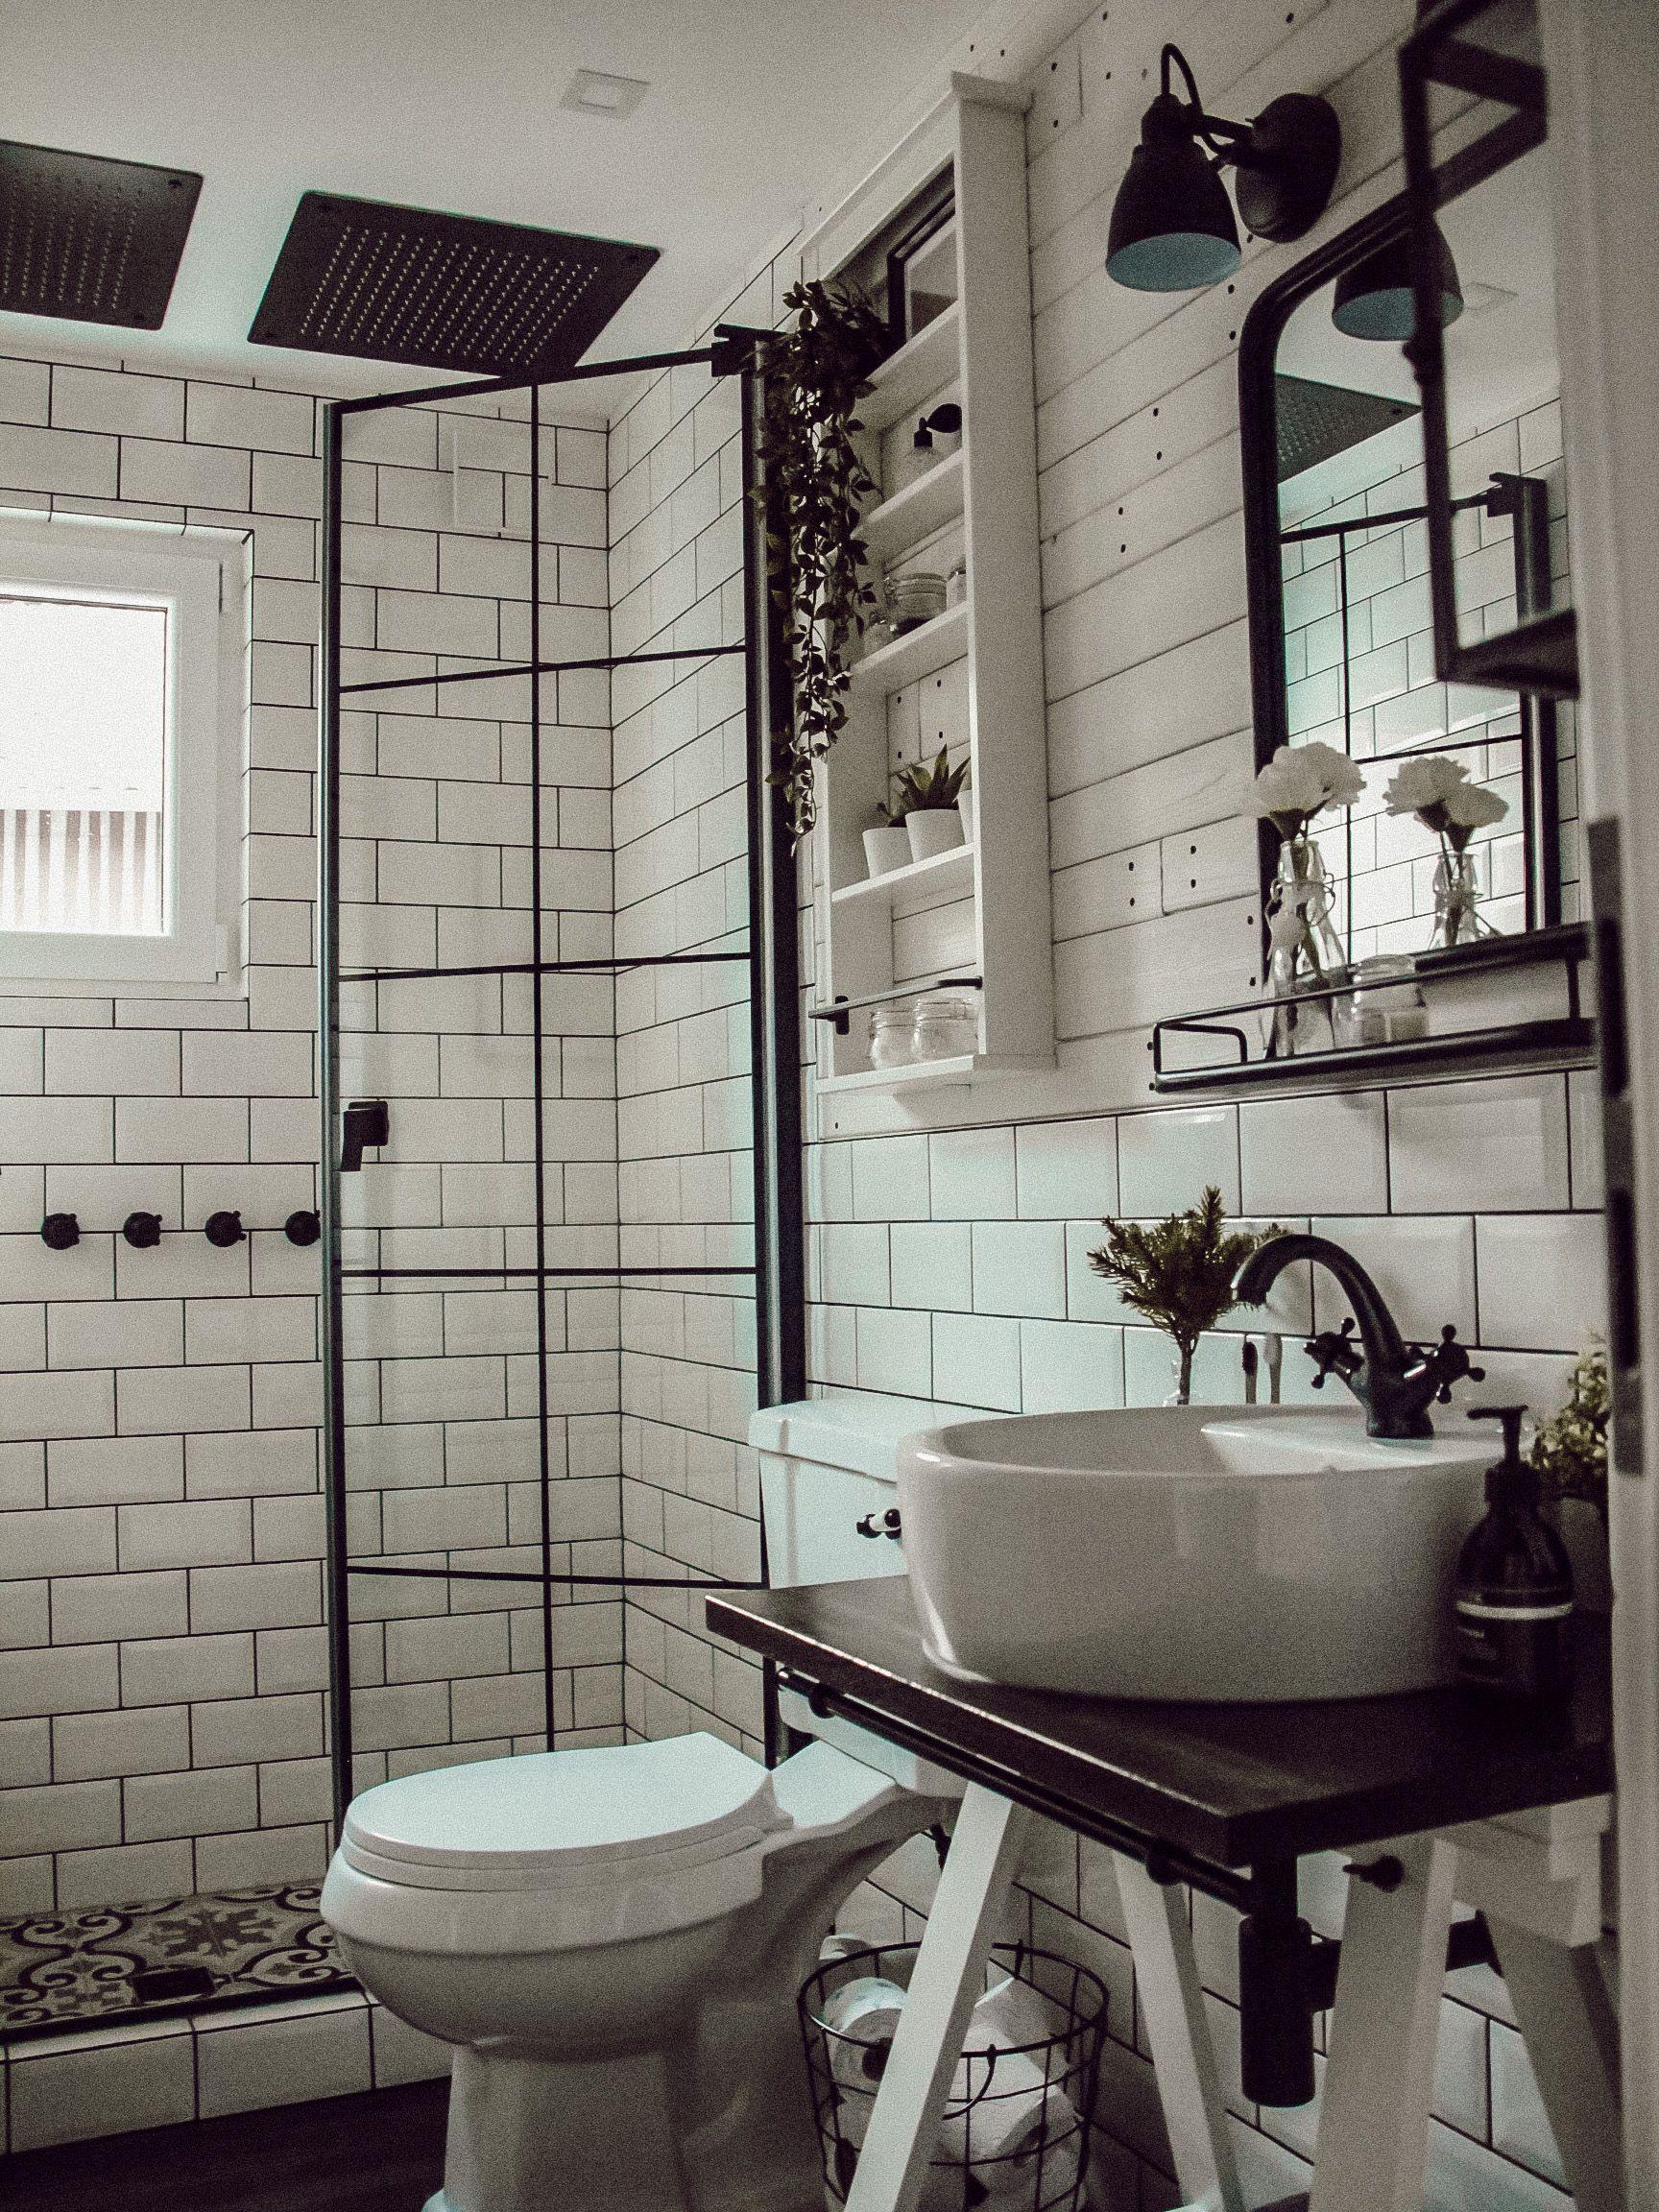 Bathroom Badezimmer Badezimmerideen Badezimmerdesign Industrial Industrialdesign Industrialdecor Inspiration Badezim In 2020 Badezimmer Mobel Badezimmer Design